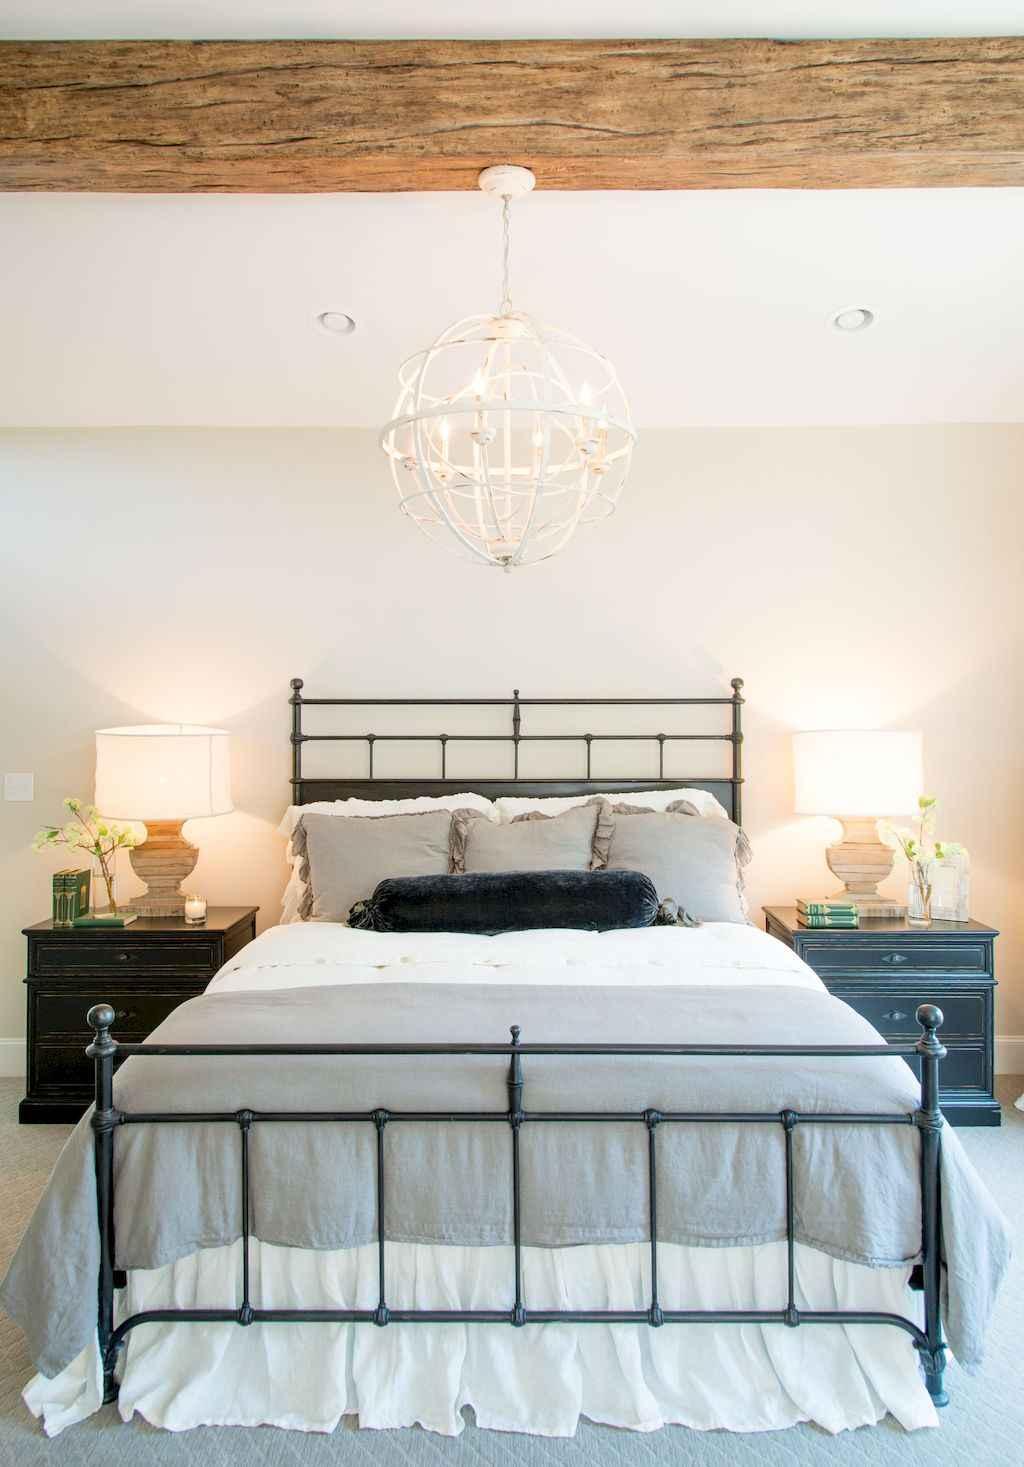 Incredible master bedroom ideas (30)